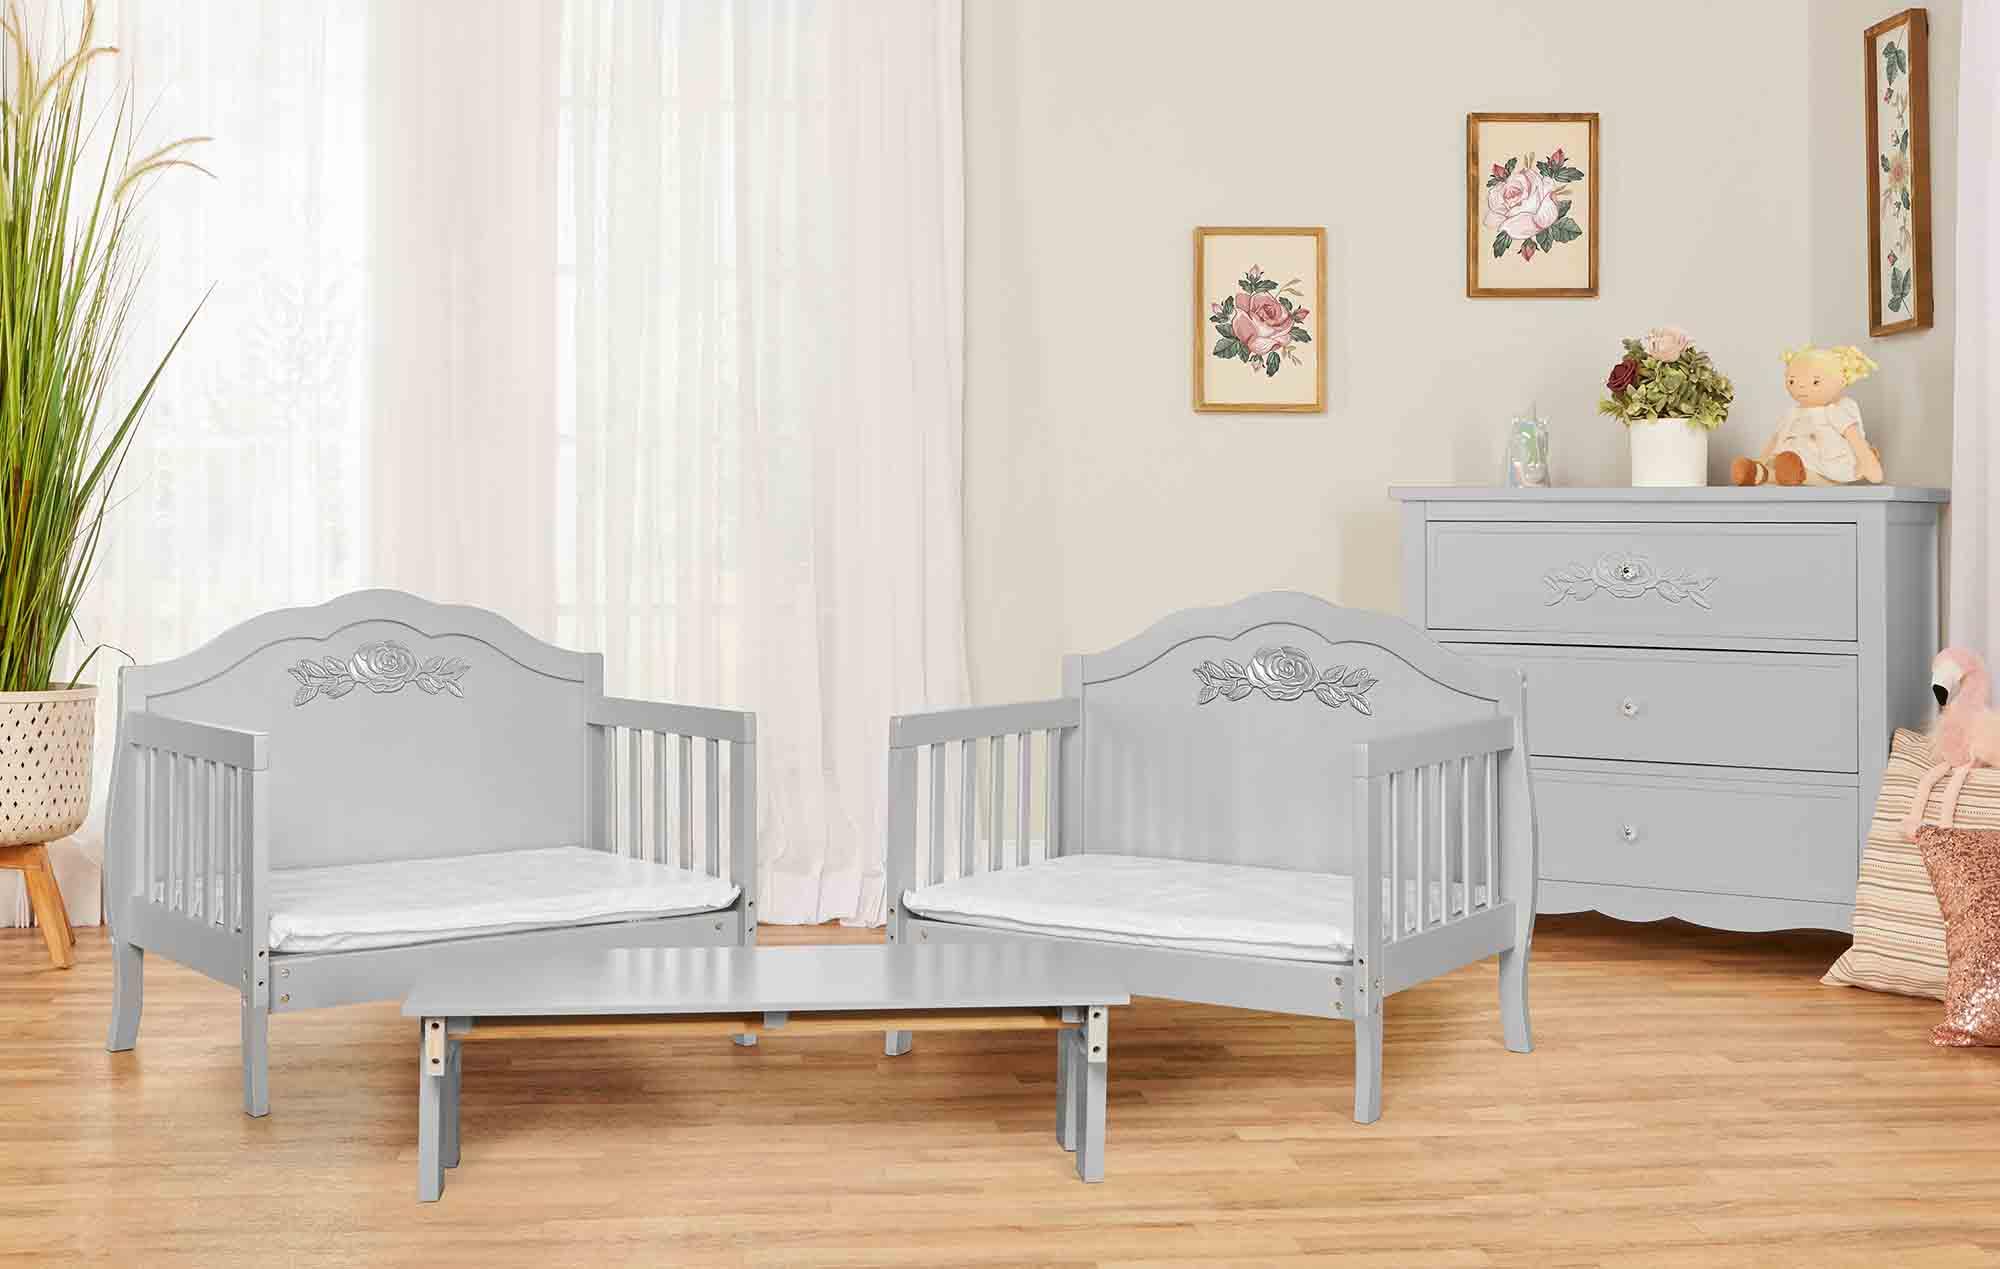 640_PLTM Rose Toddler Bed RmScene 01